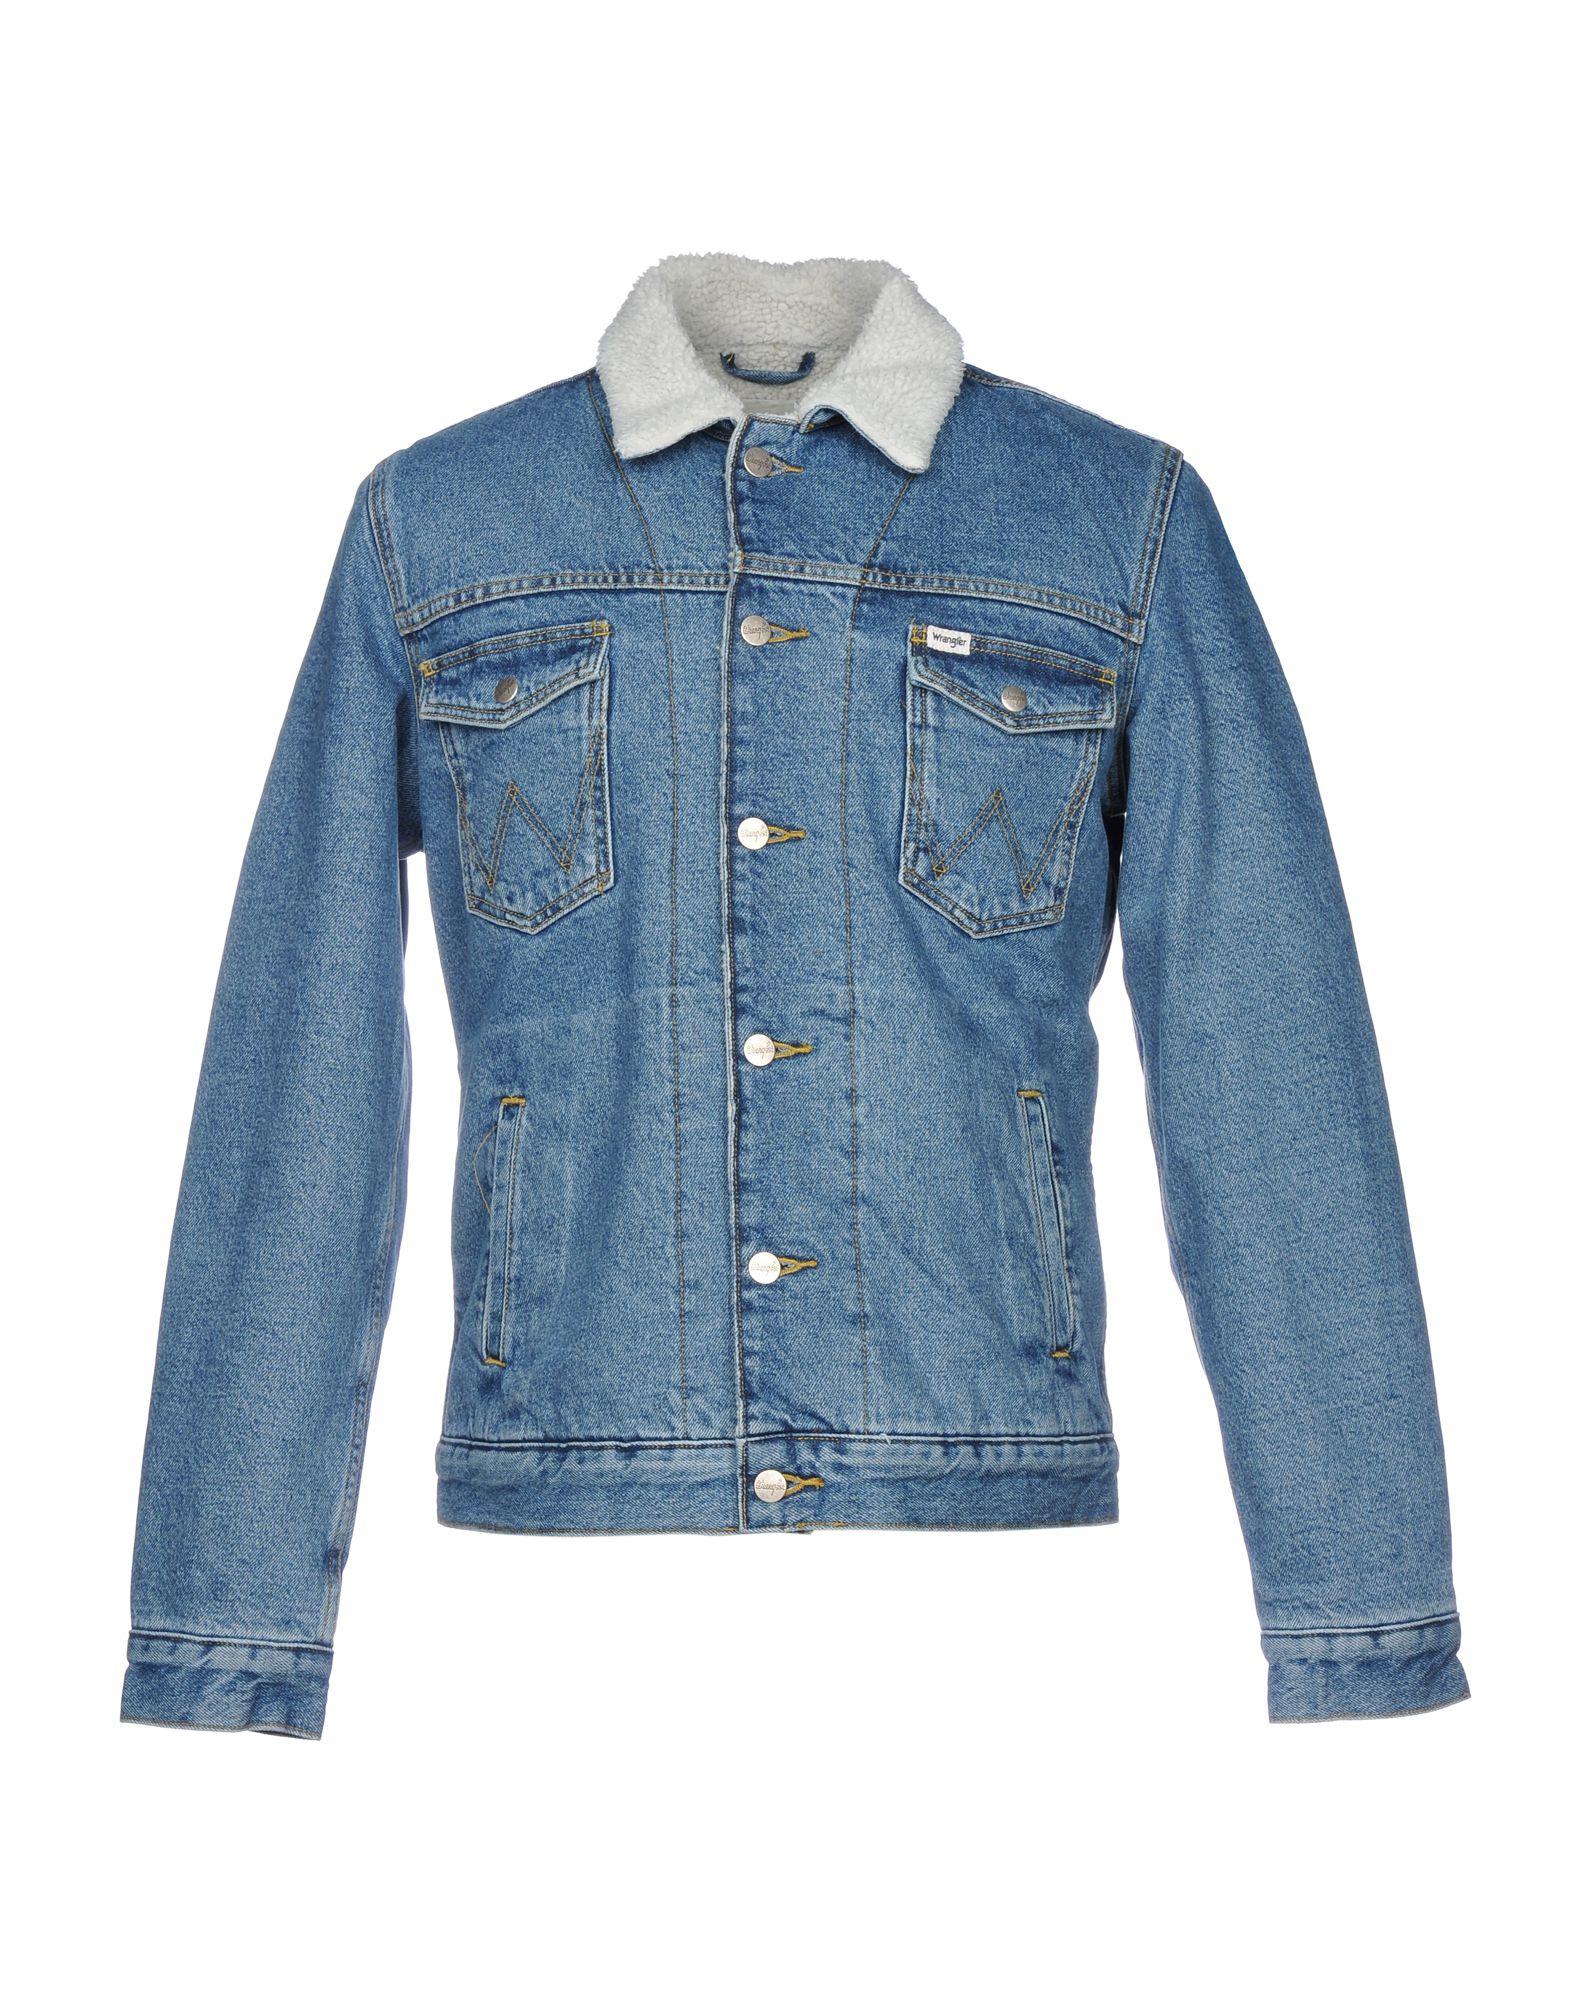 Giubbotto Jeans Wrangler Wrangler Jeans Uomo - 42674235VG b075eb